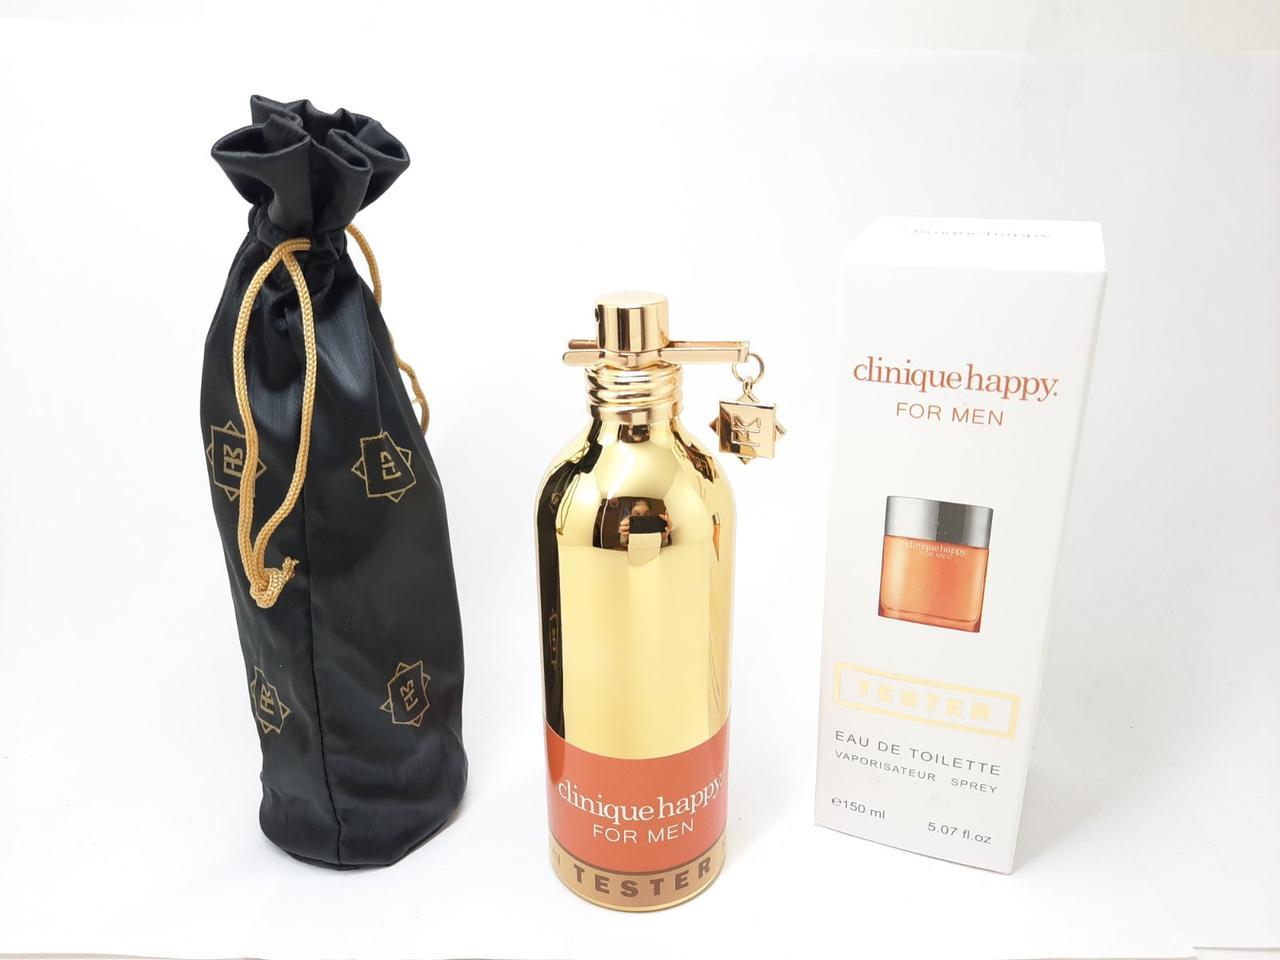 Тестер мужской парфюмированой воды Clinique Happy For Men MONTALE (Клиник Хеппи Фо Мэн) 150 мл